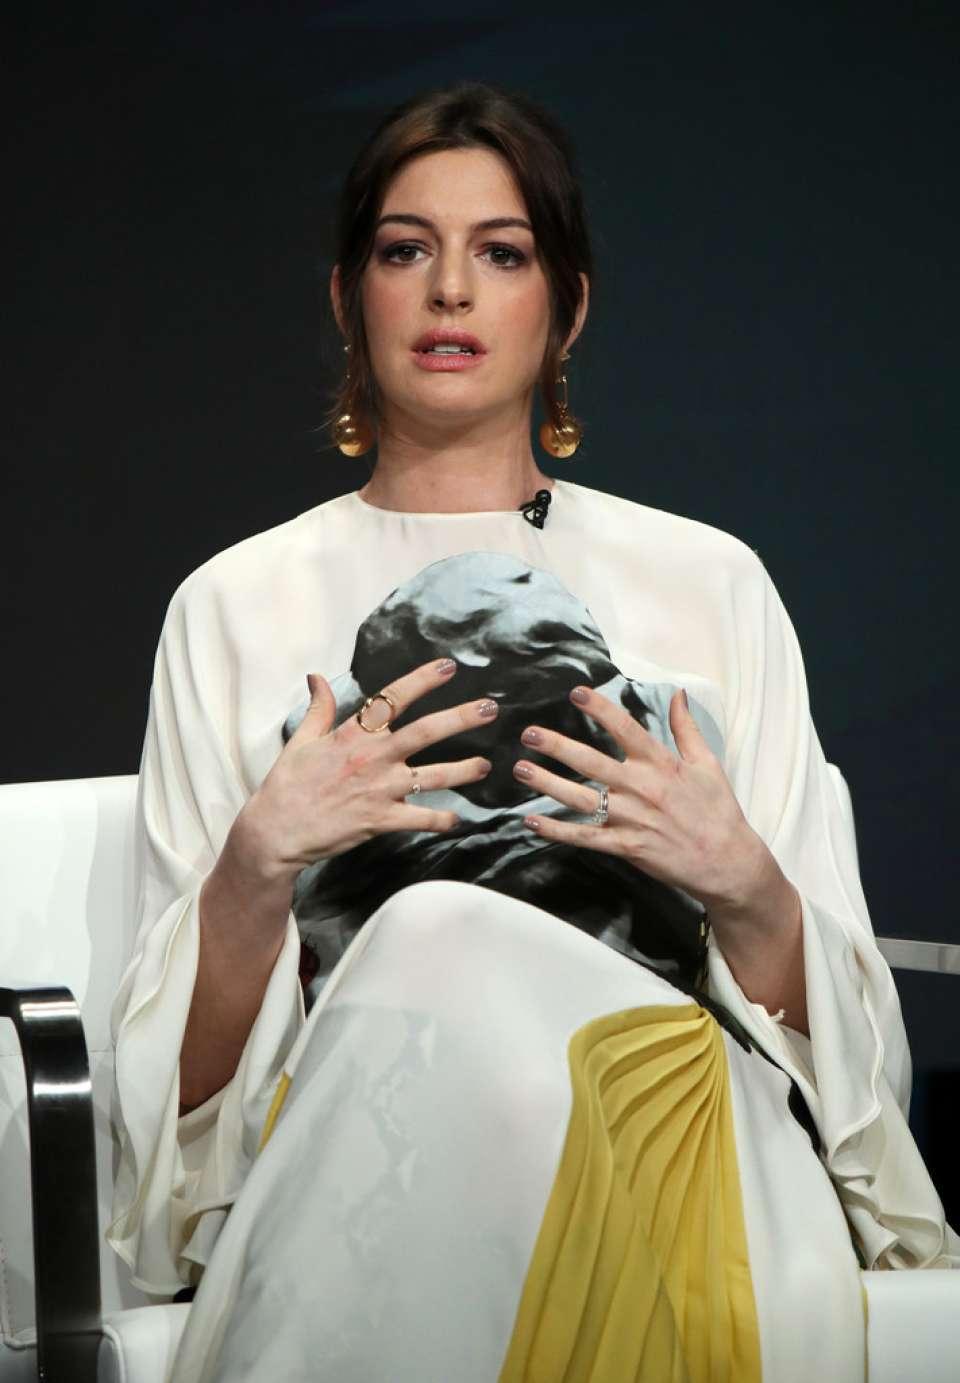 Anne Hathaway - 2019 Summer TCA Press Tour in Beverly Hills